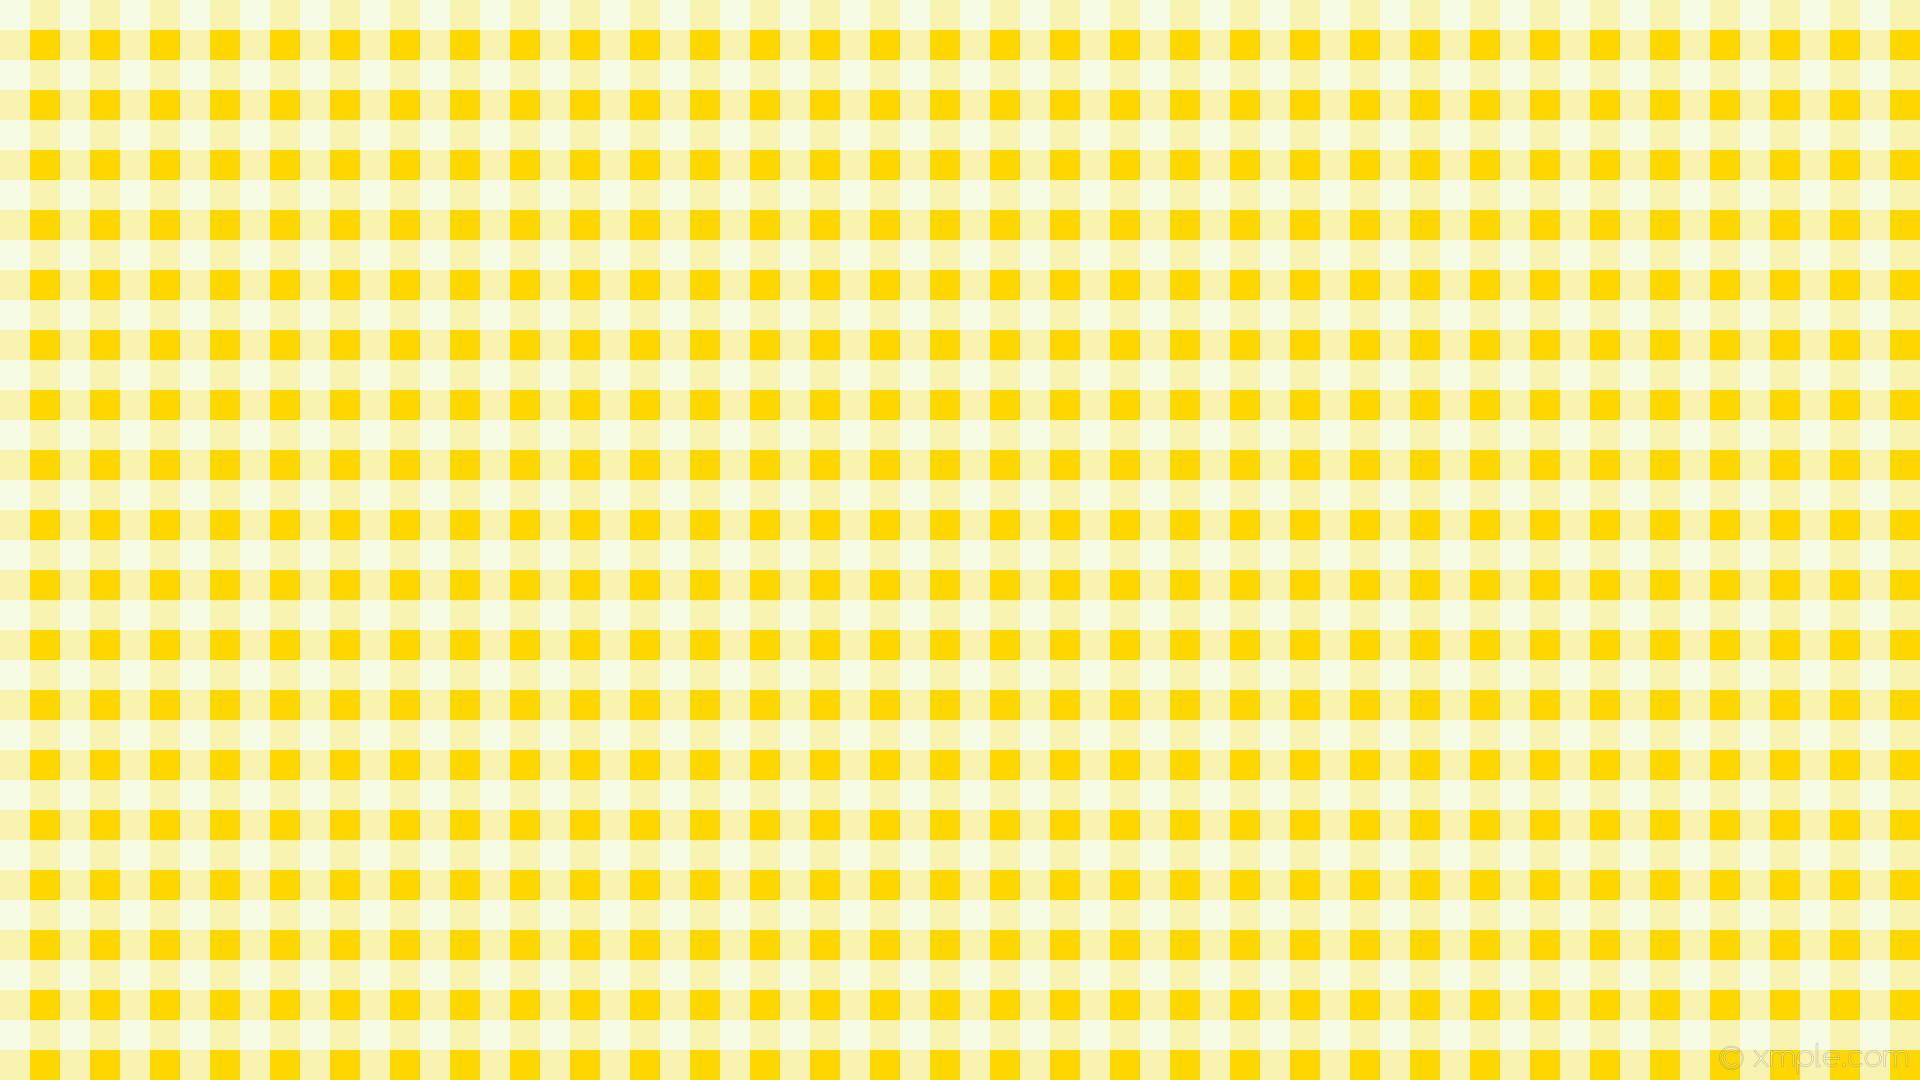 Wallpaper Aesthetic Yellow Checkered Background Petswall